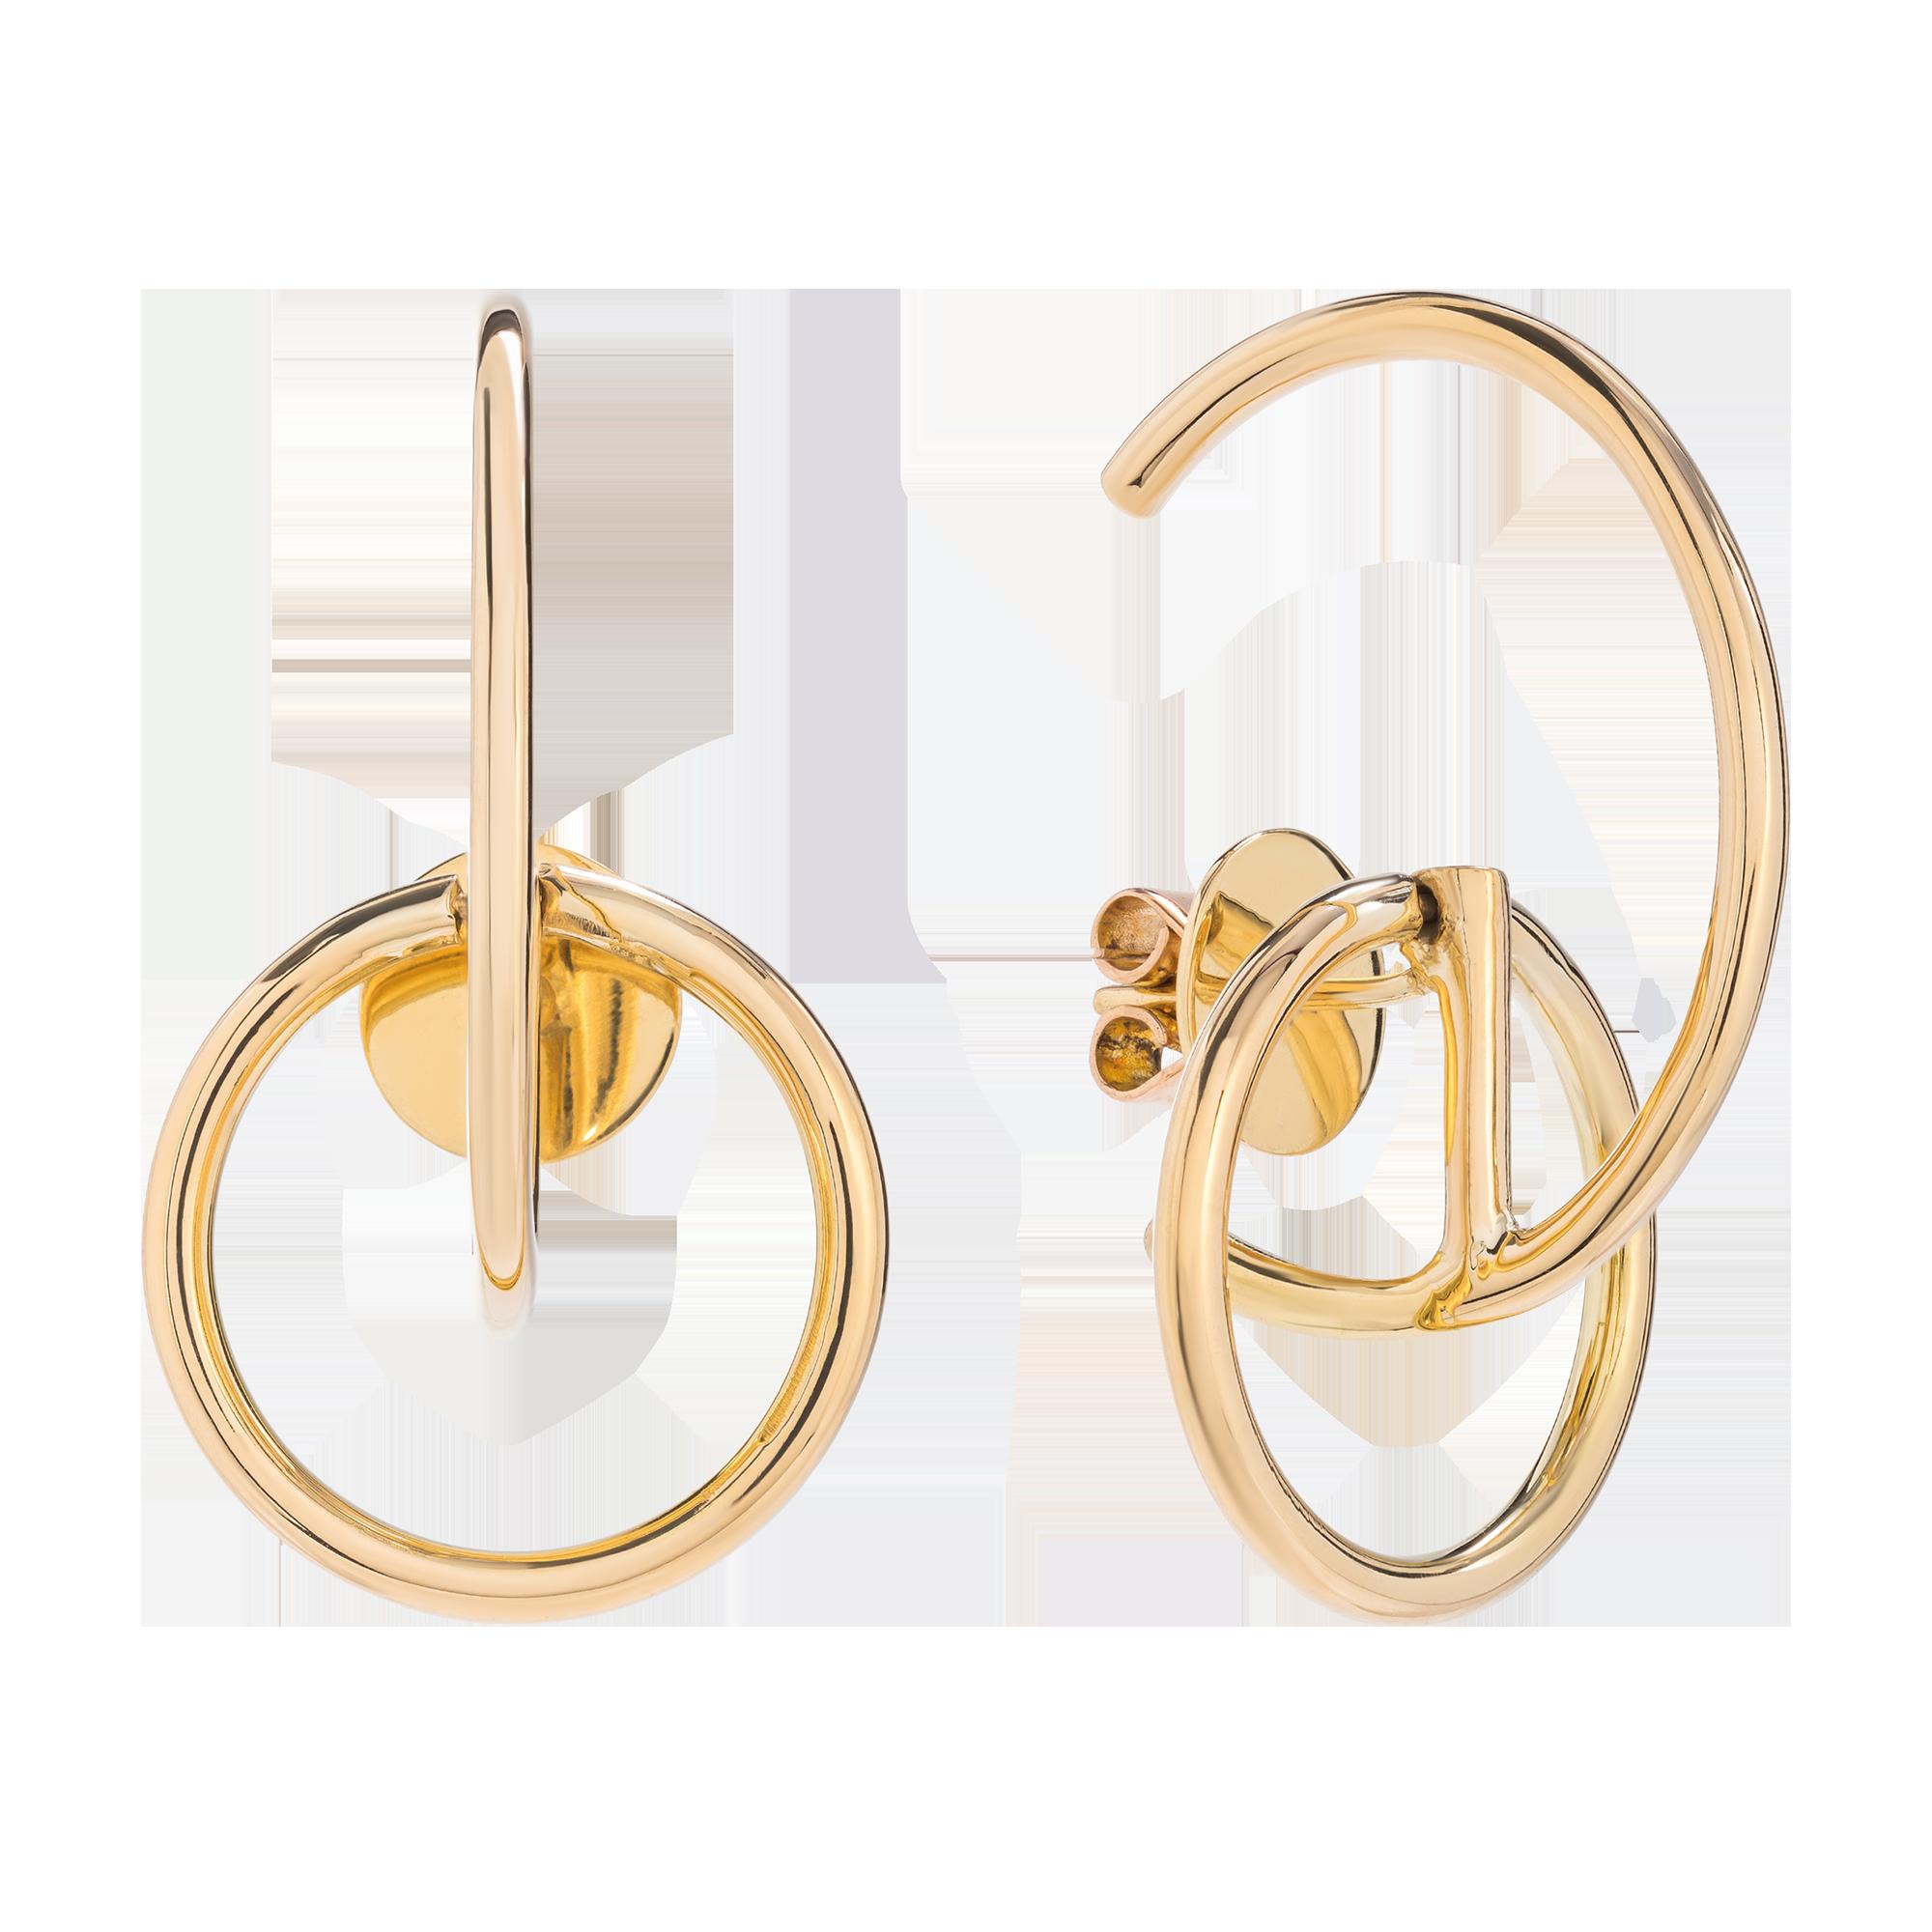 Hoops earrings product image